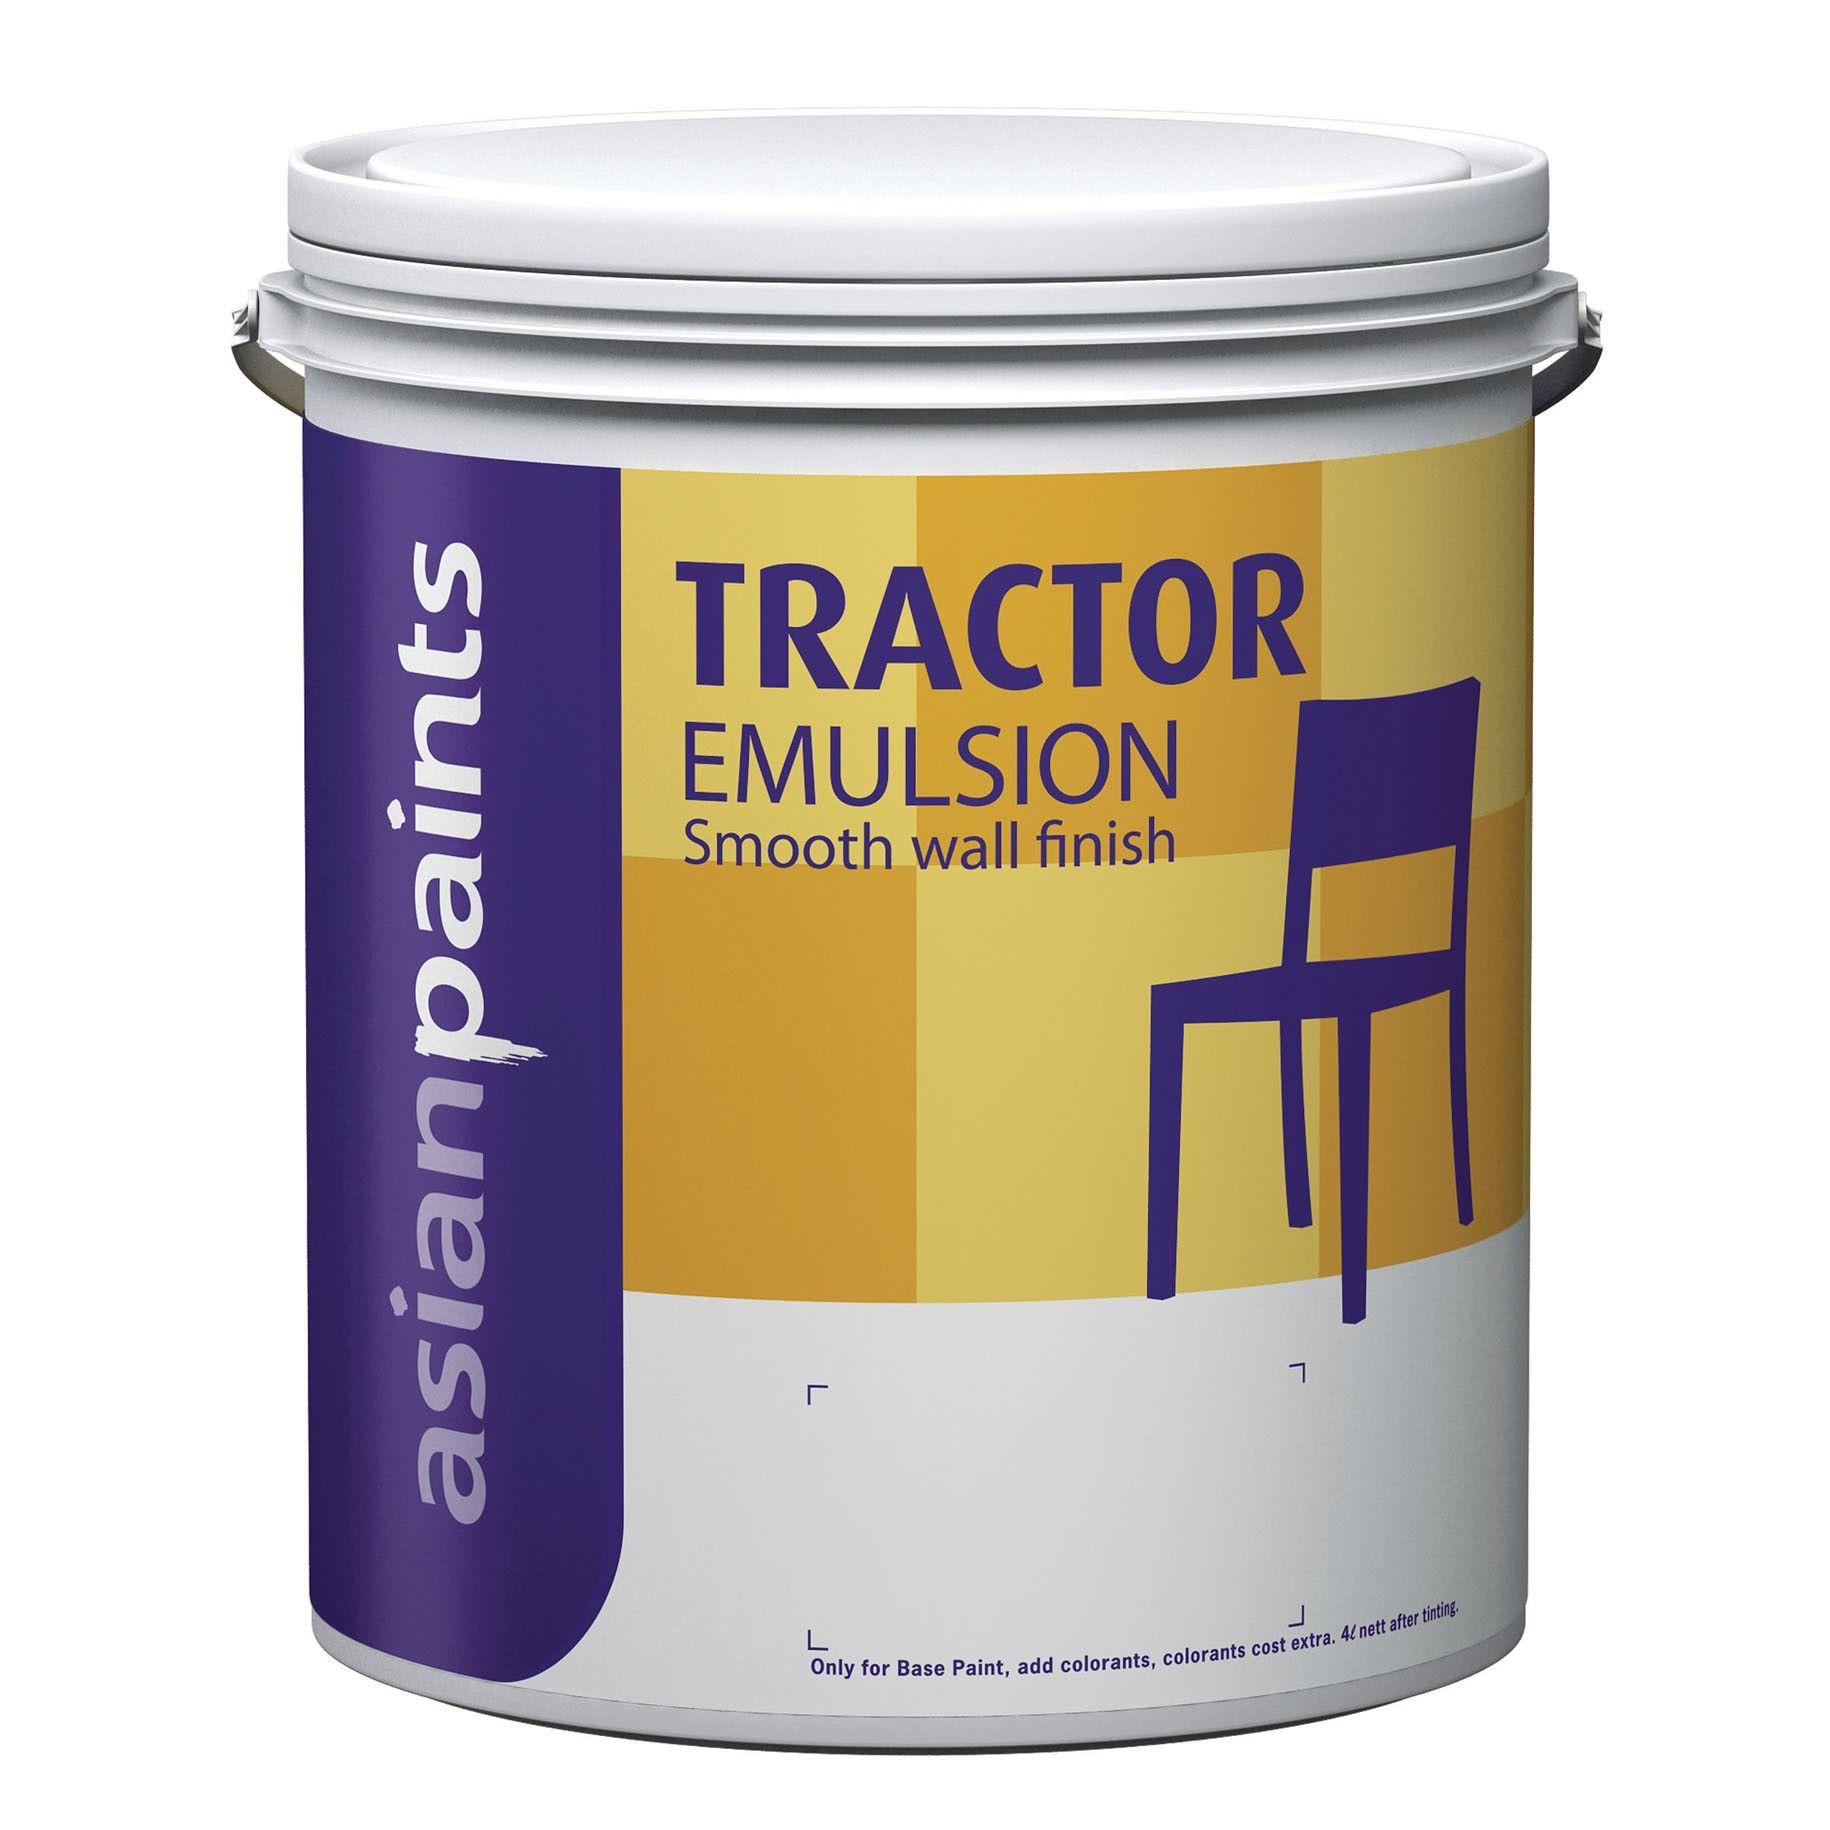 Asian Paints Tractor Emulsion Buy Online In India Asian Paints Paint Prices Magnetic Paint